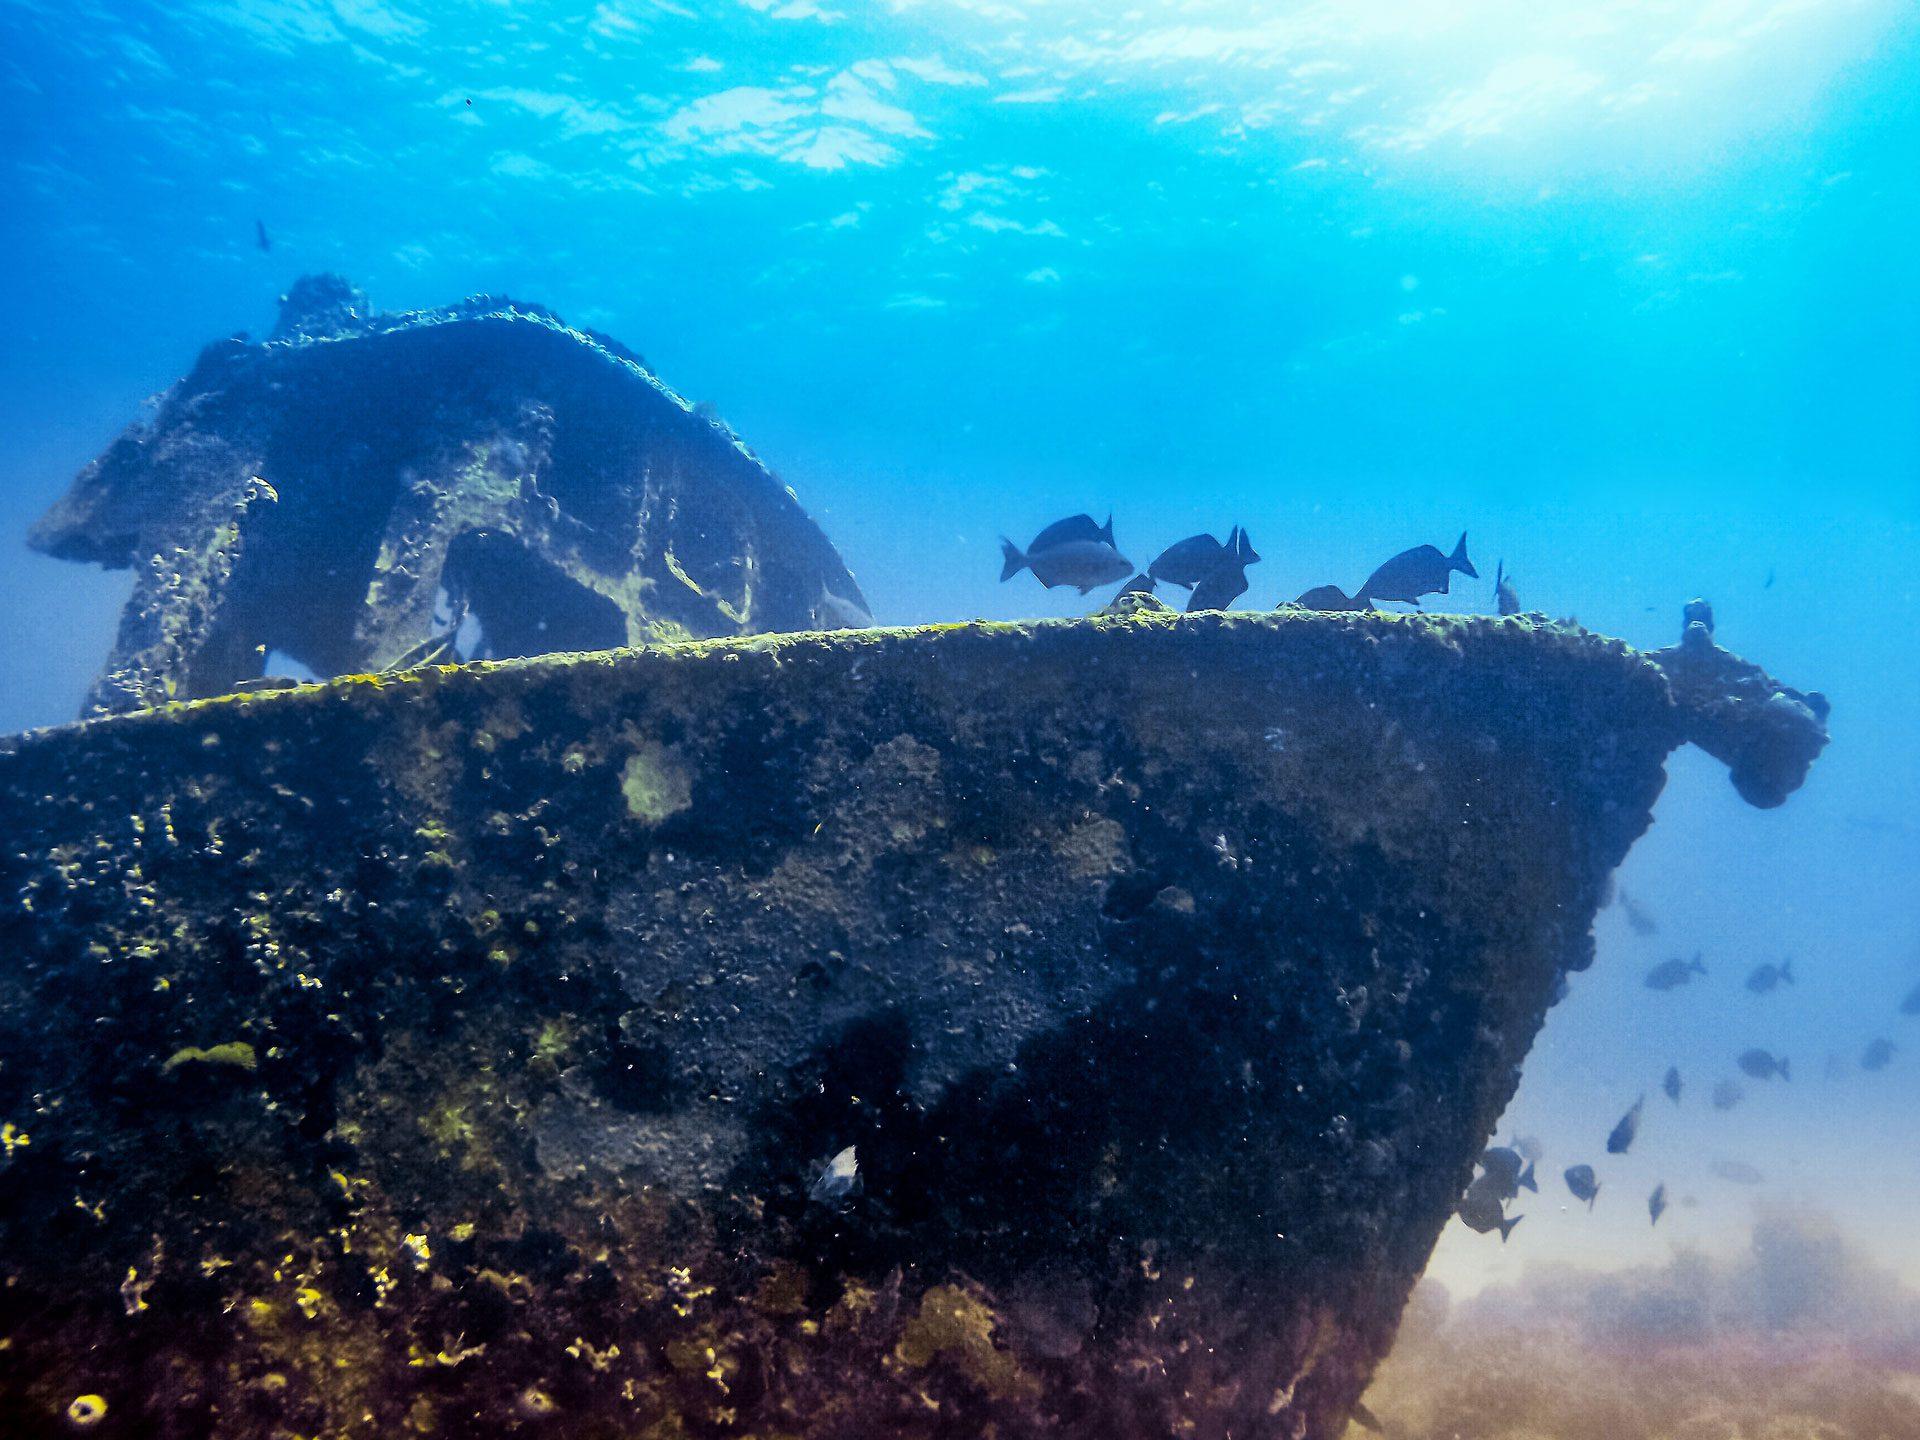 Shipwreck in ocean close to Varadero, Cuba